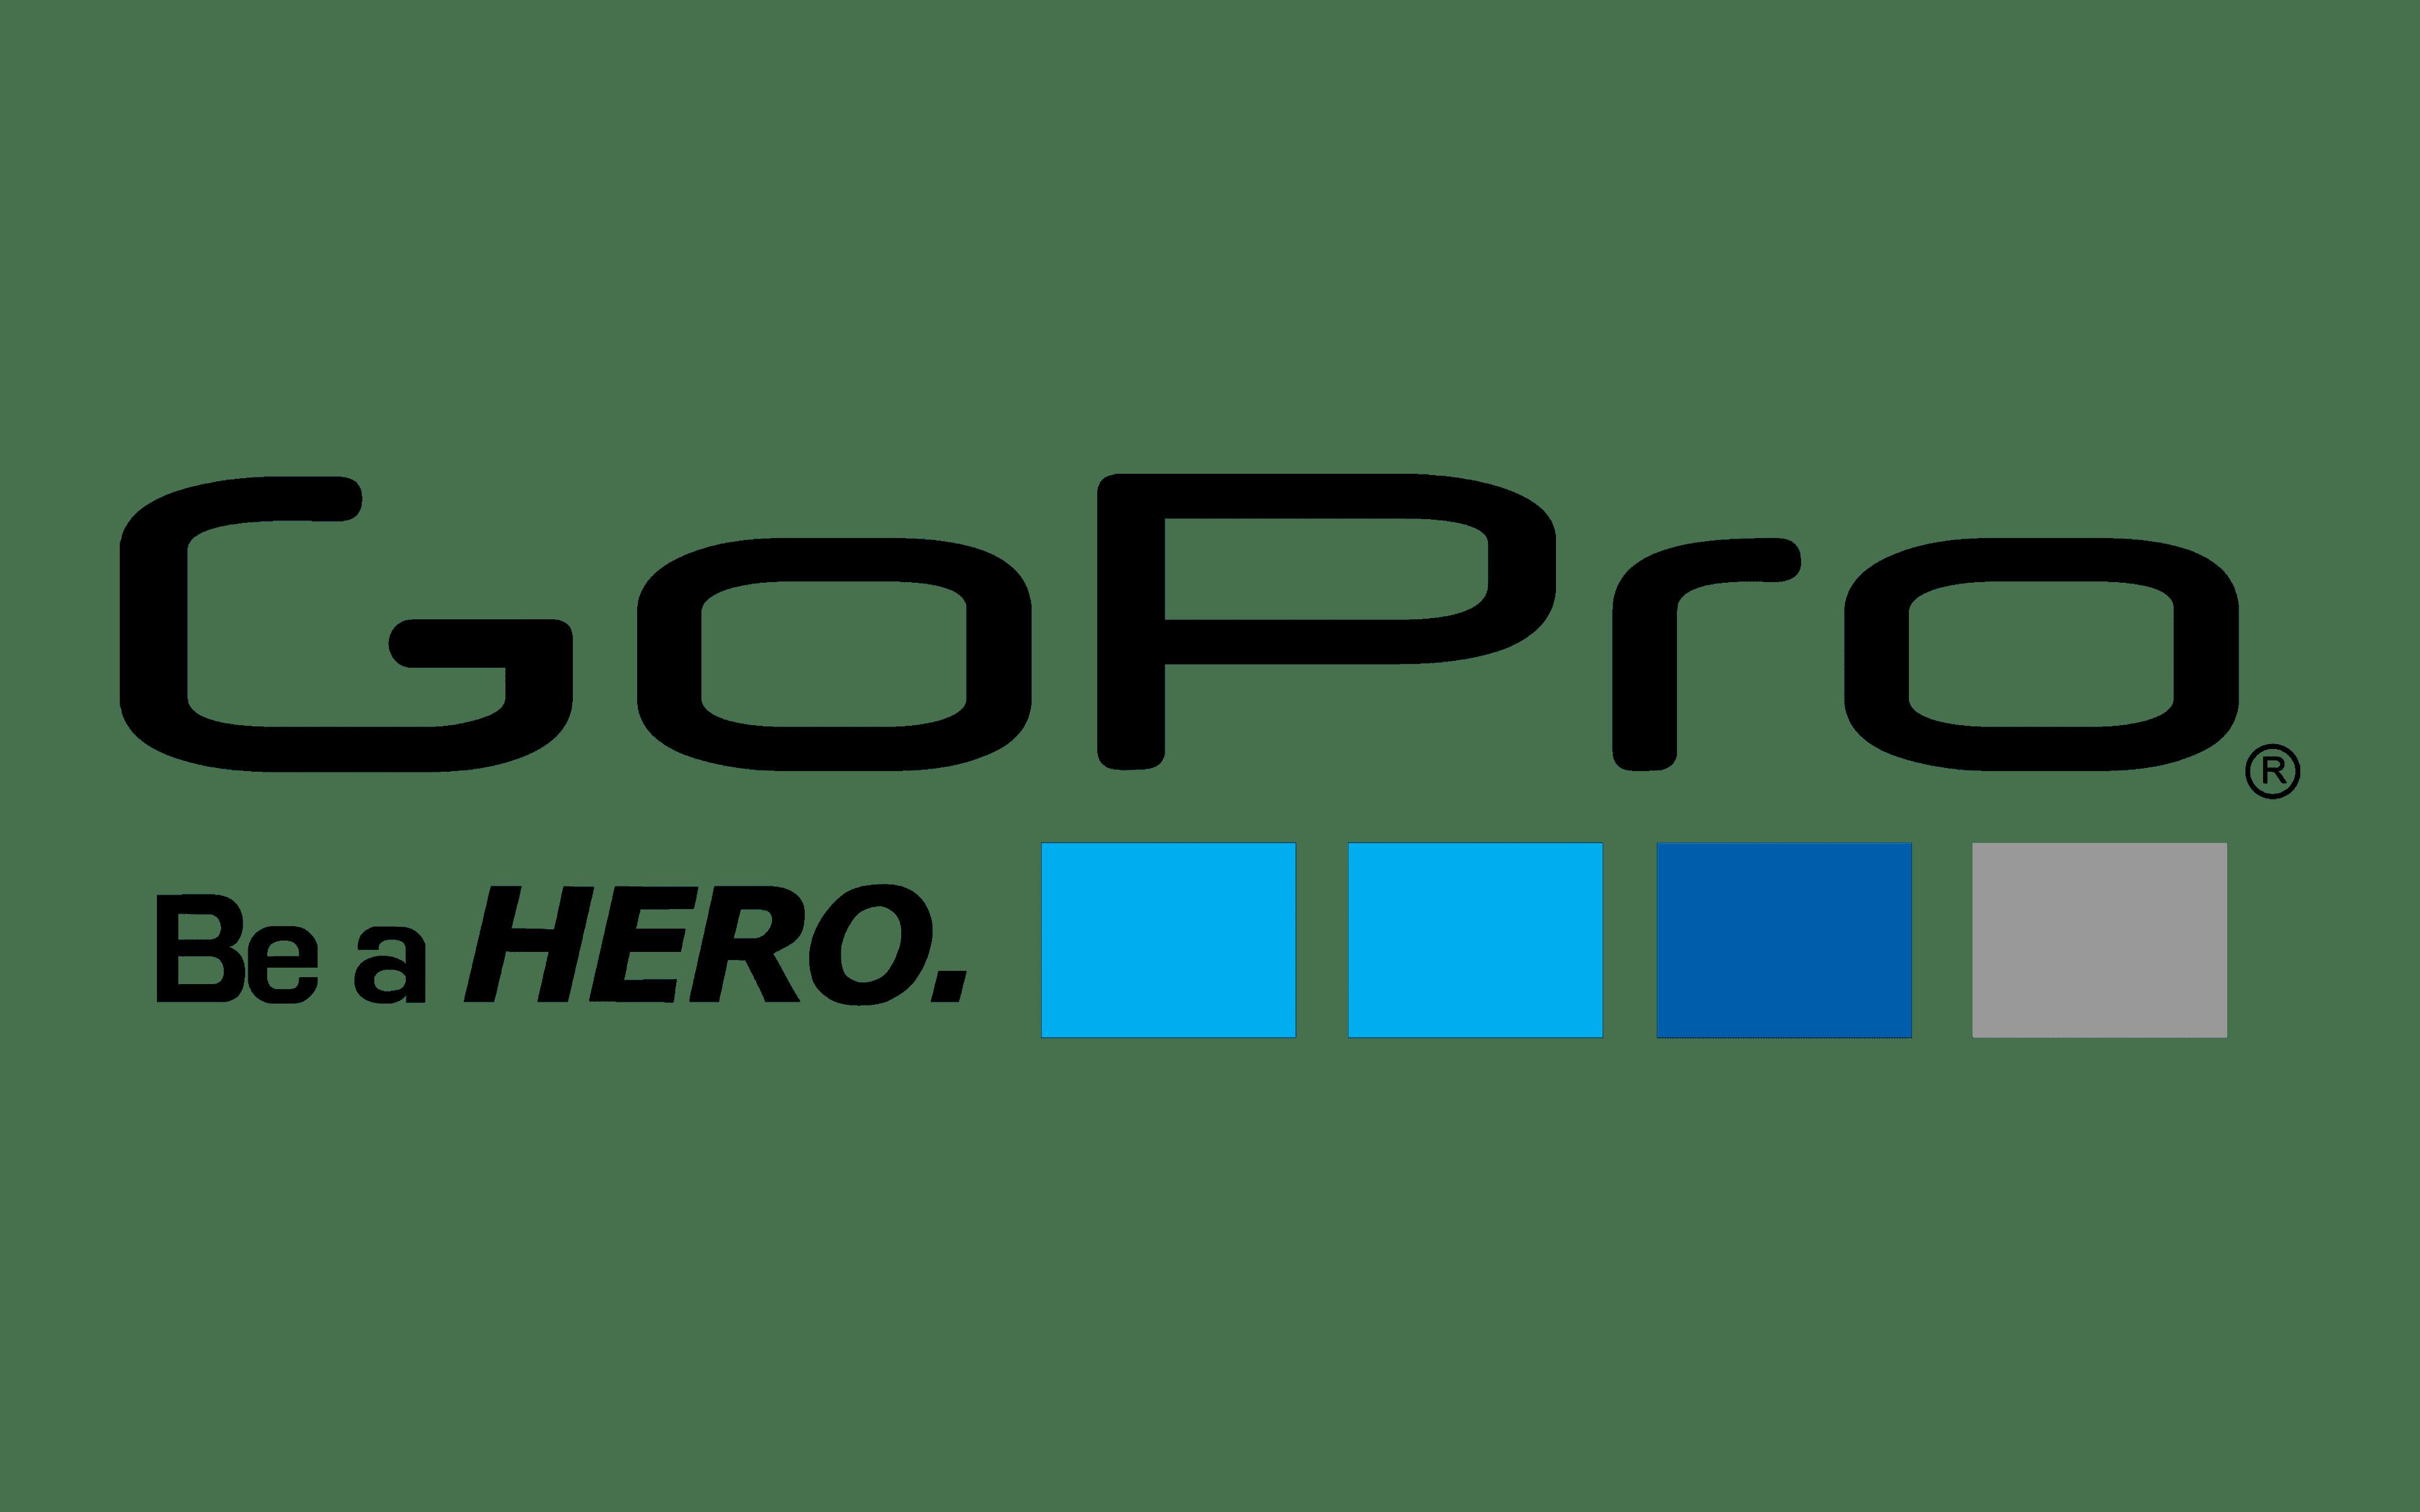 https://controlfreak.com.sg/wp-content/uploads/2021/01/Gopro-Logo.png